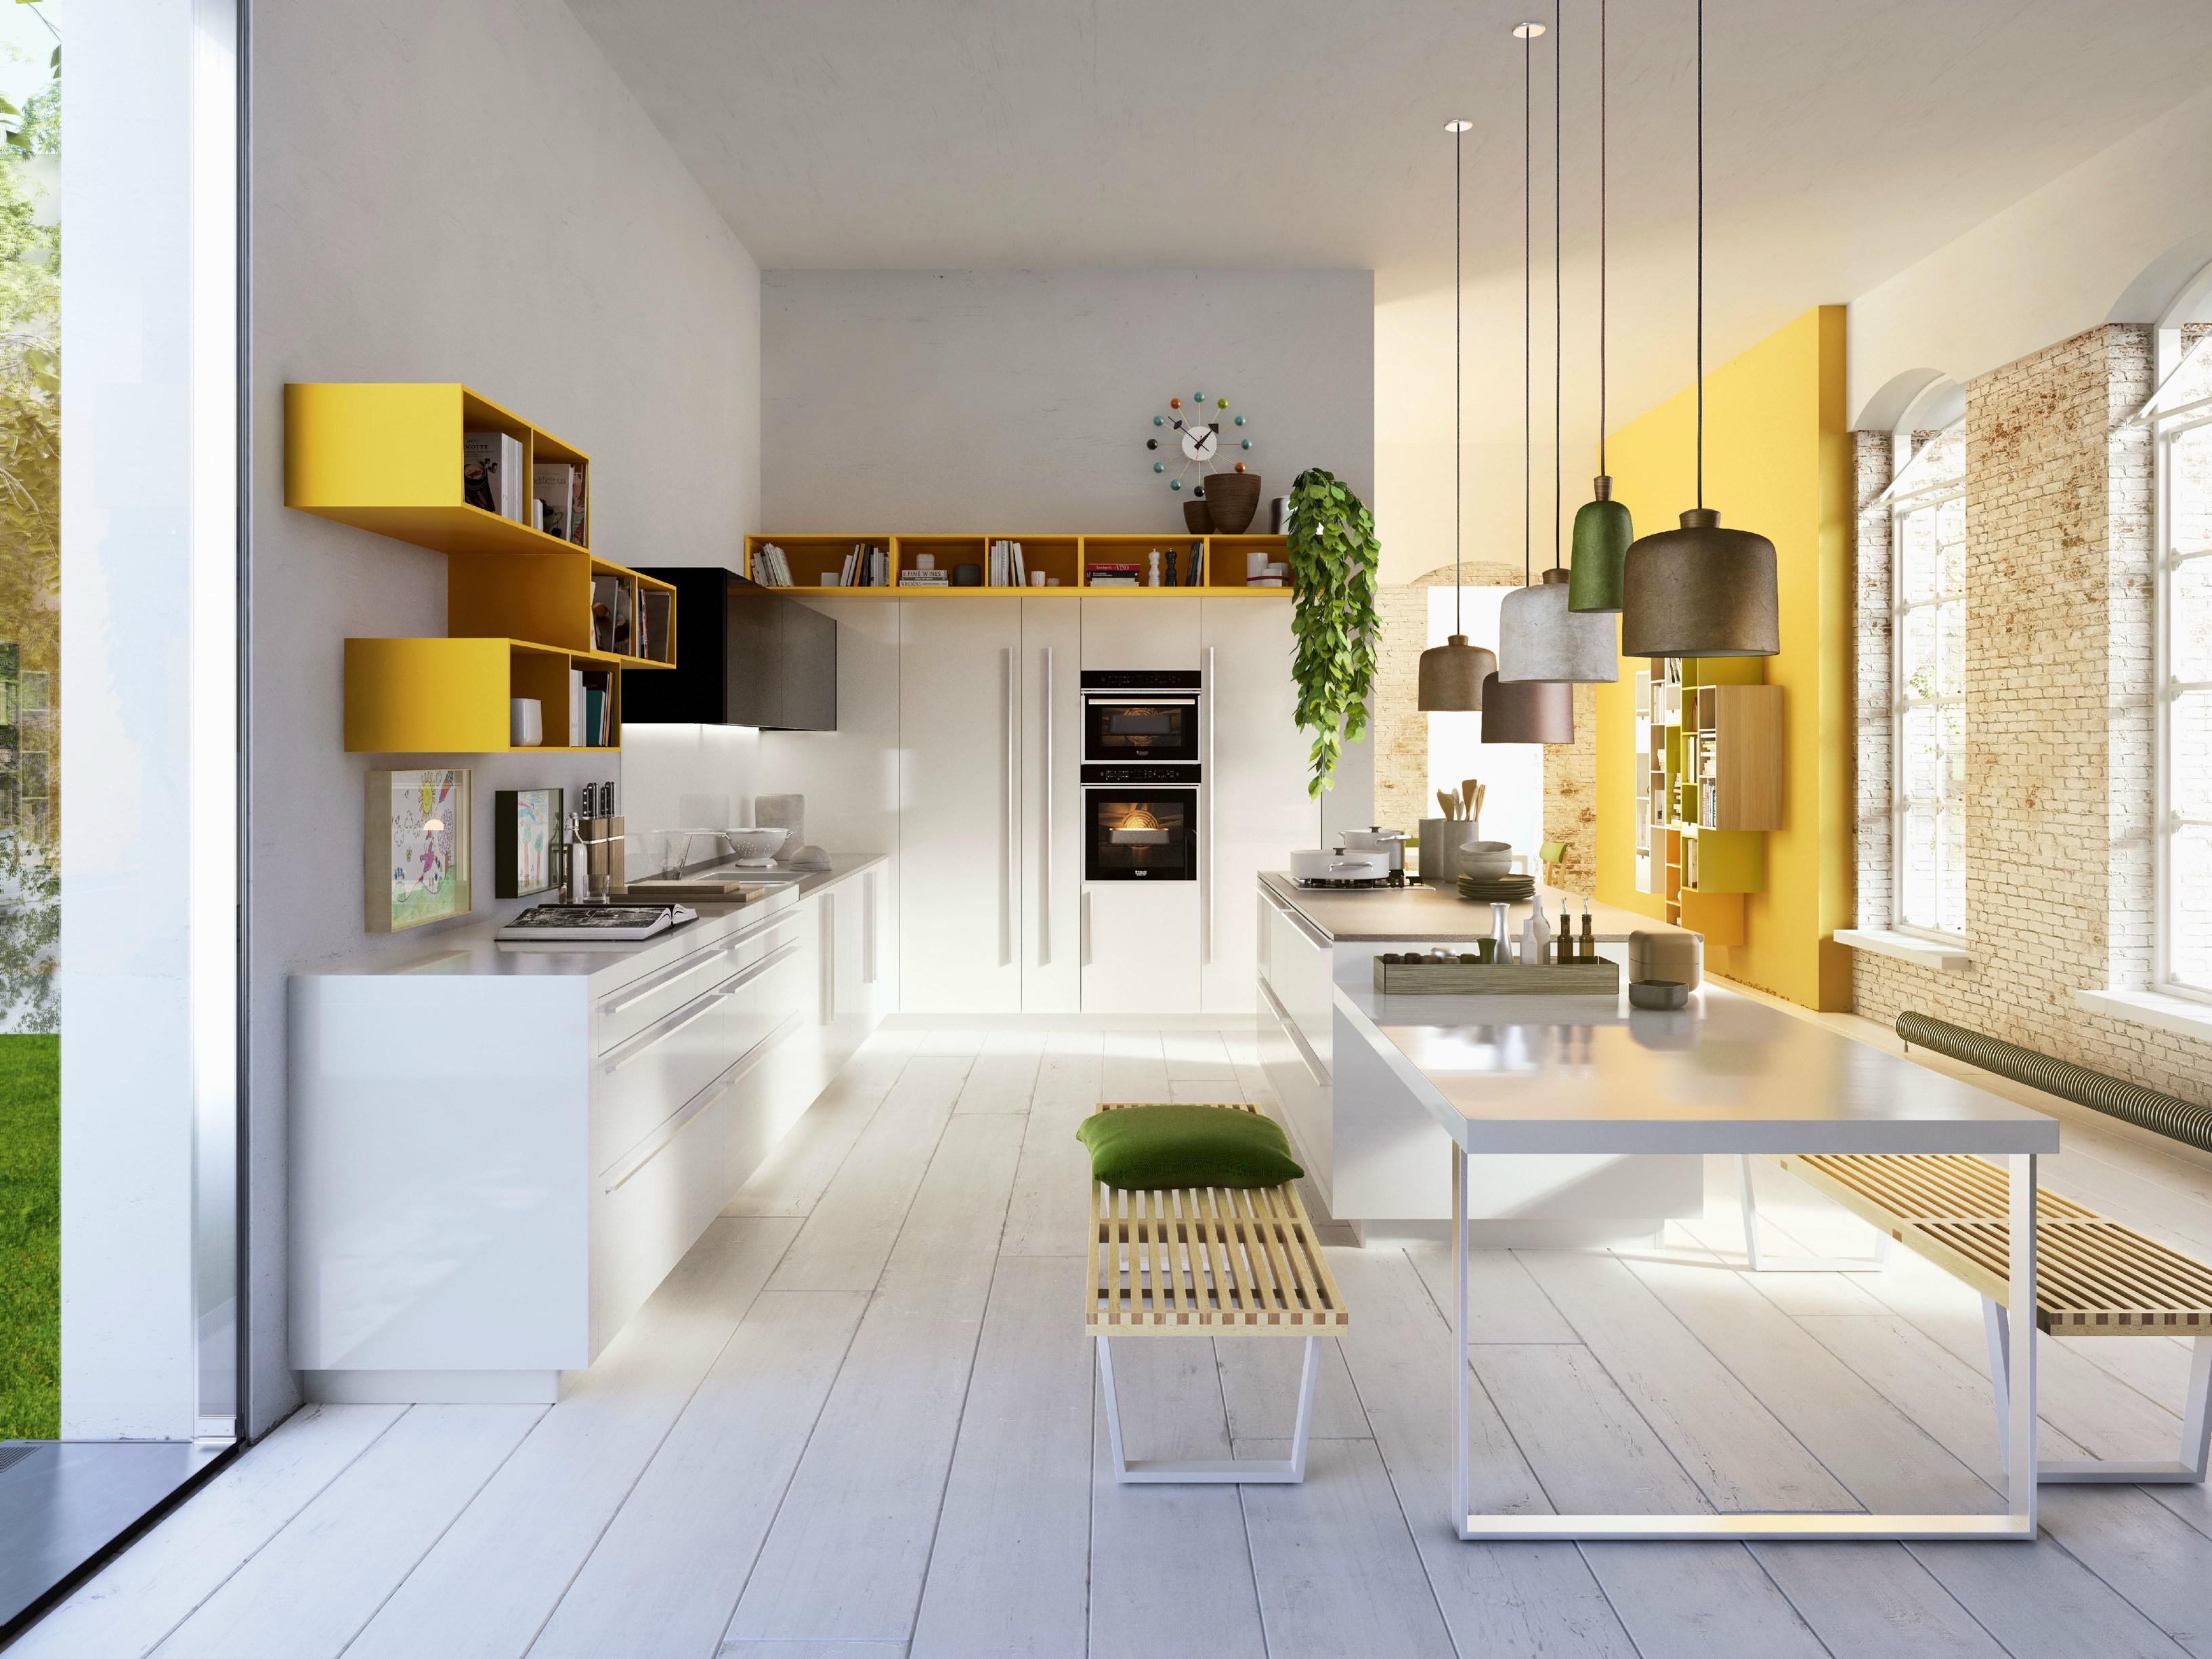 Cuisine blanche mur jaune: cuisine mur c f bb etagere murale avec ...